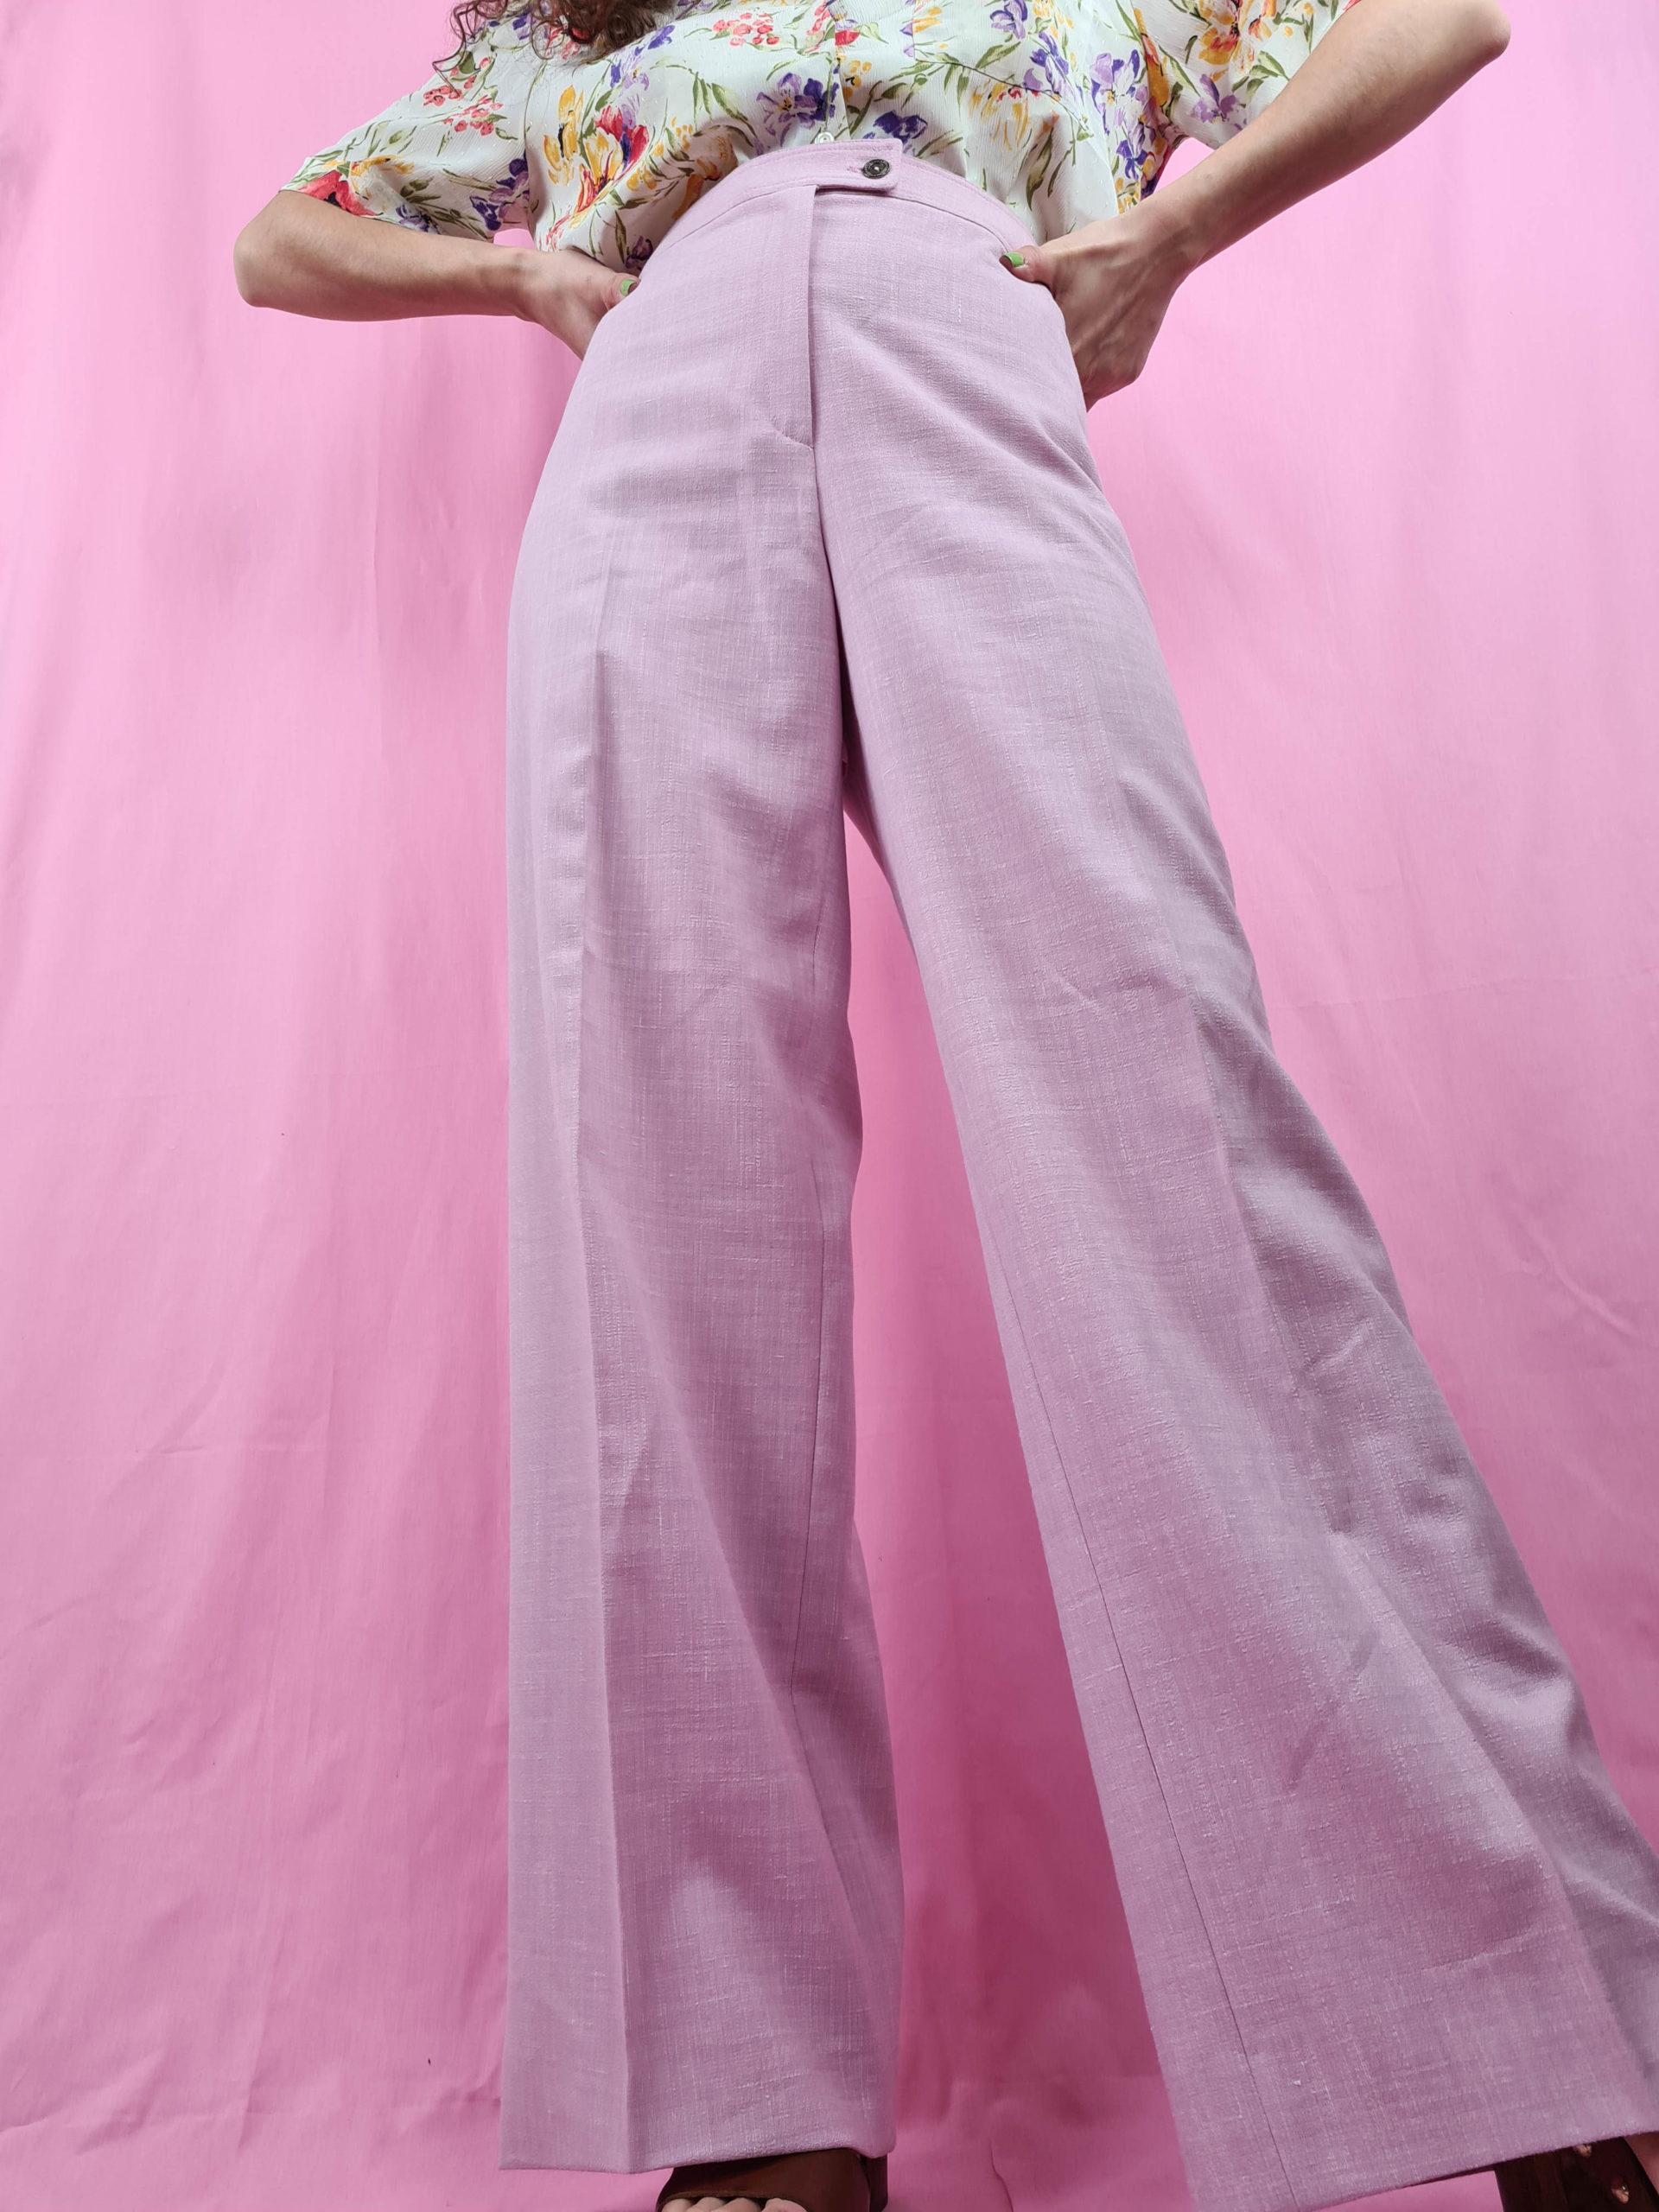 pantalon à pince rose pastel (5)